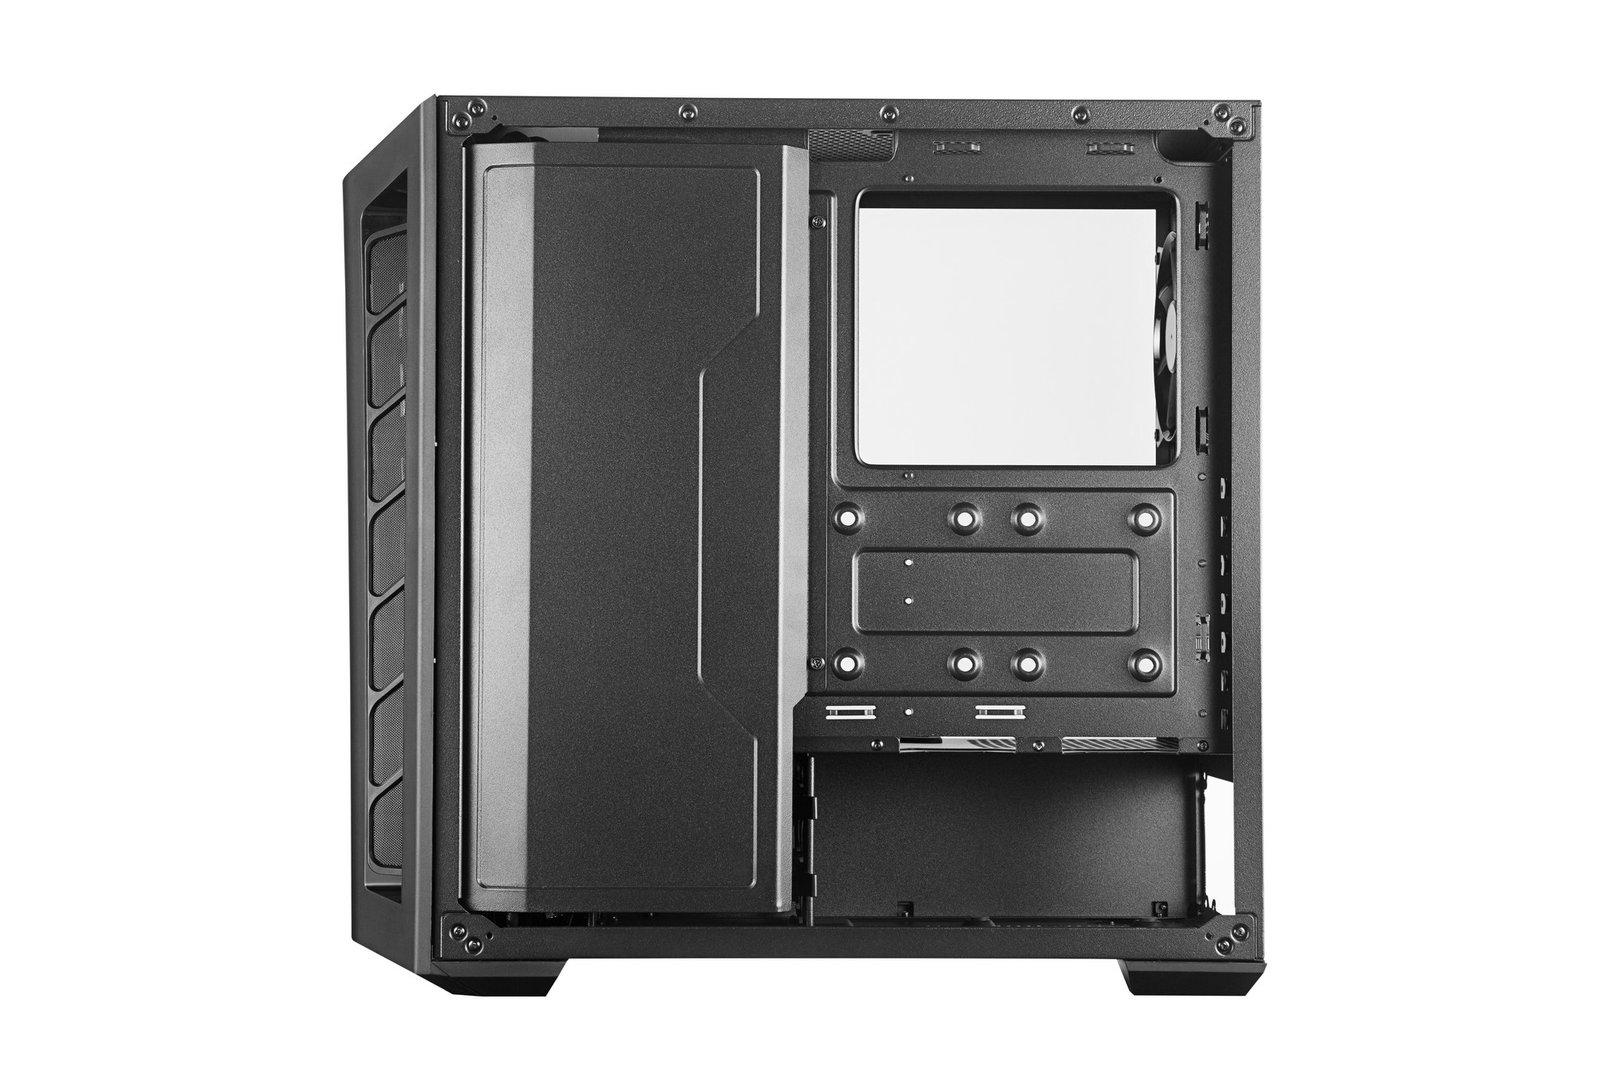 Cooler Master MasterBox MB350P